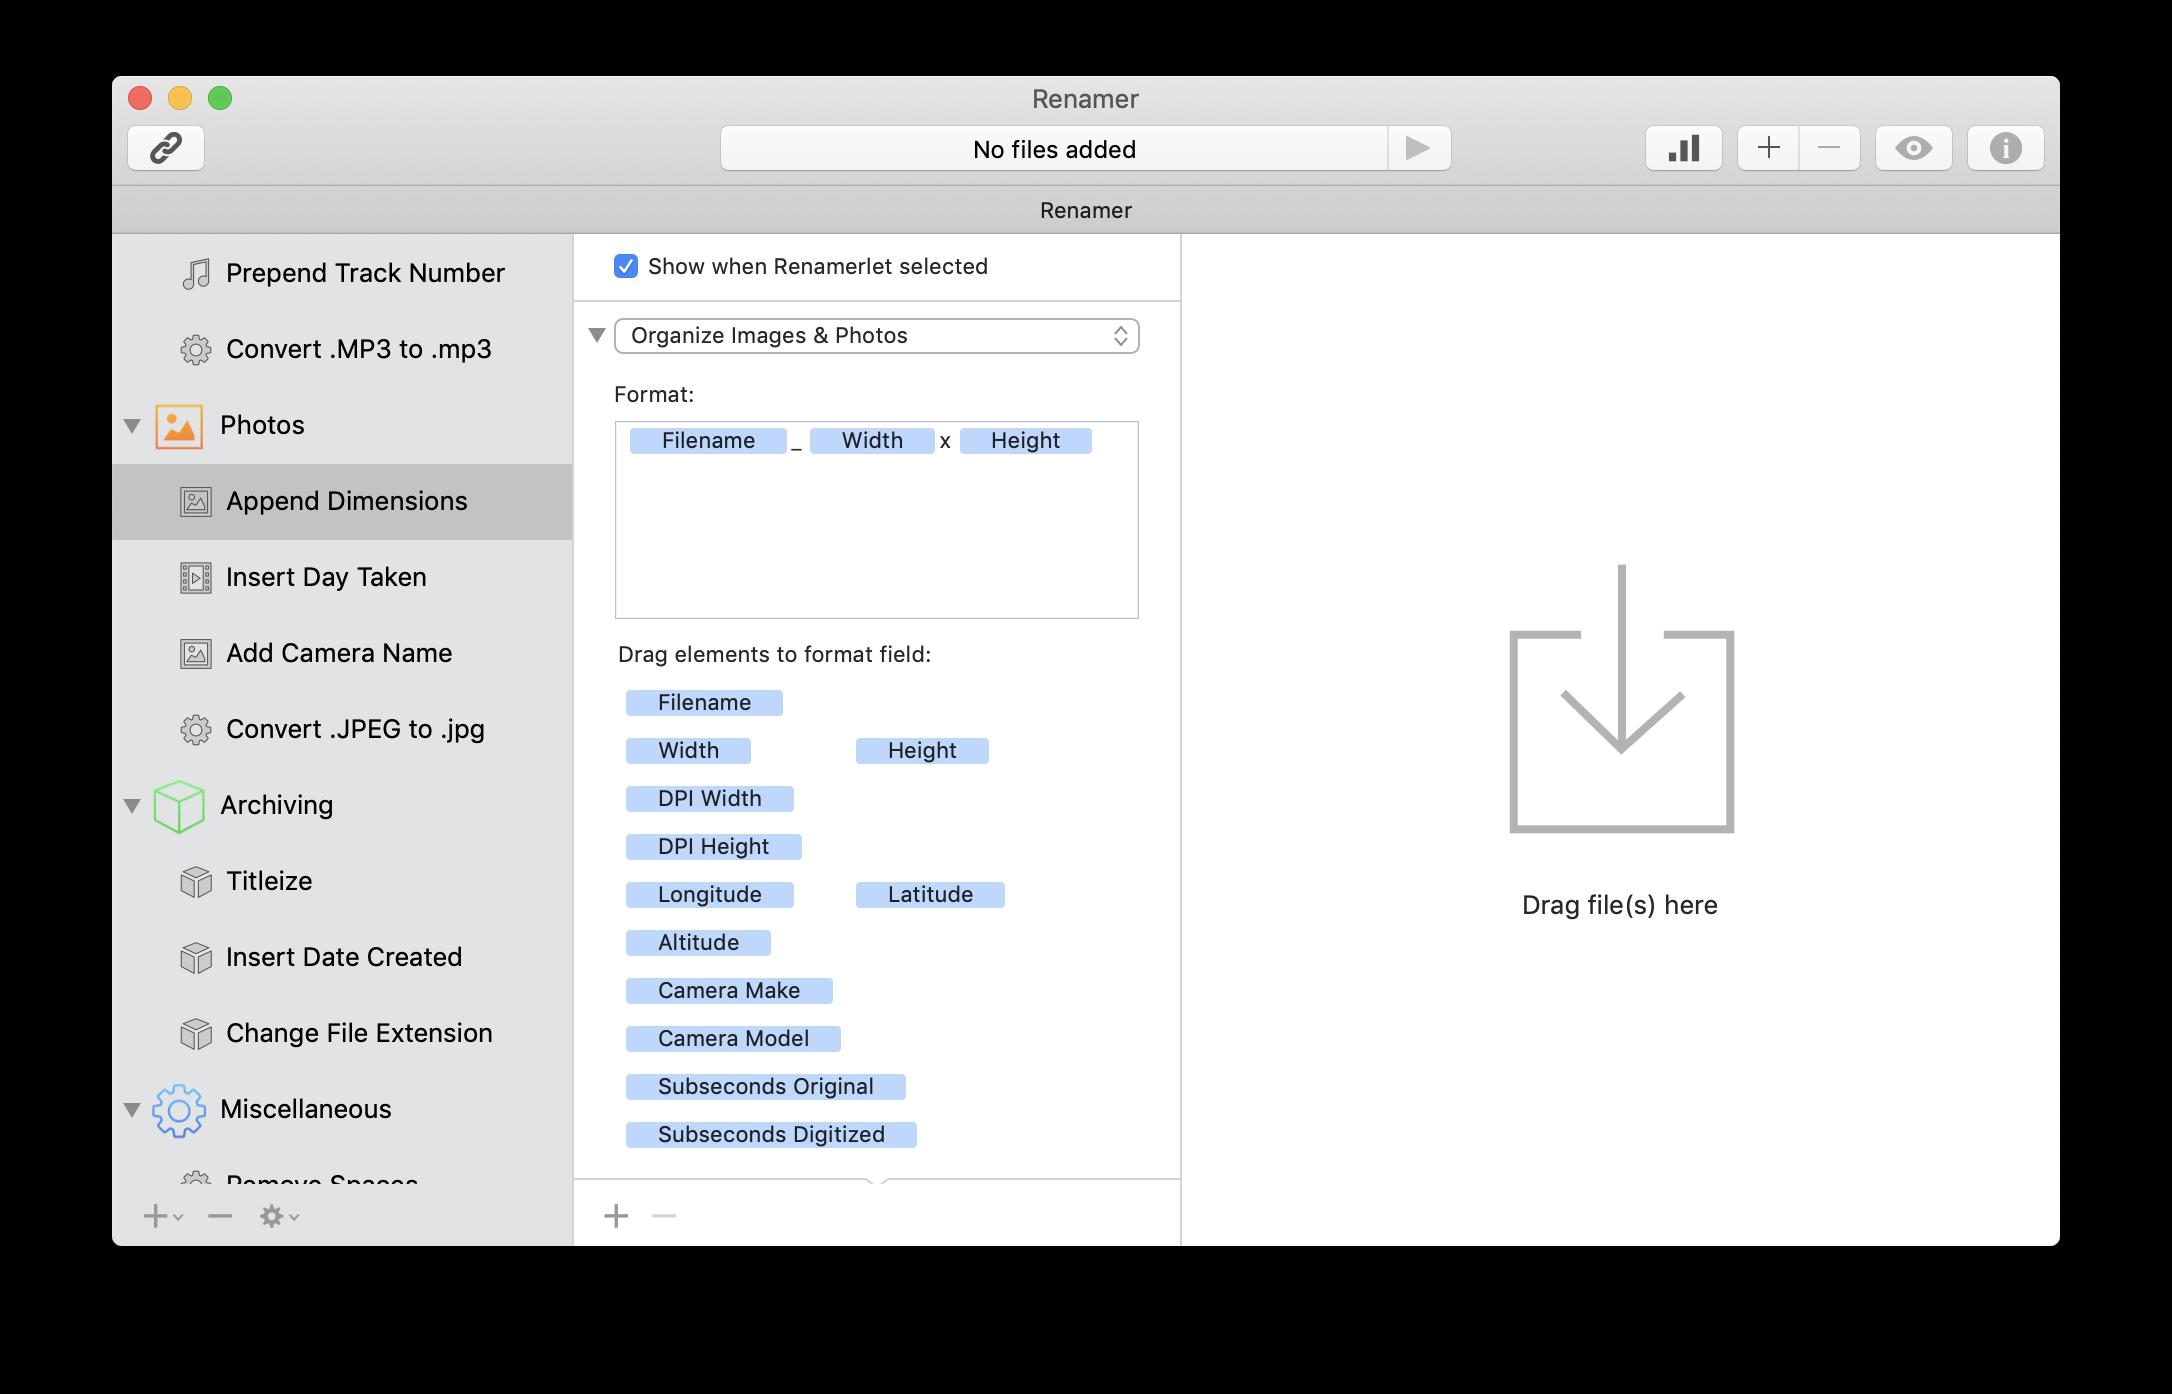 Use Renamer app to organize files